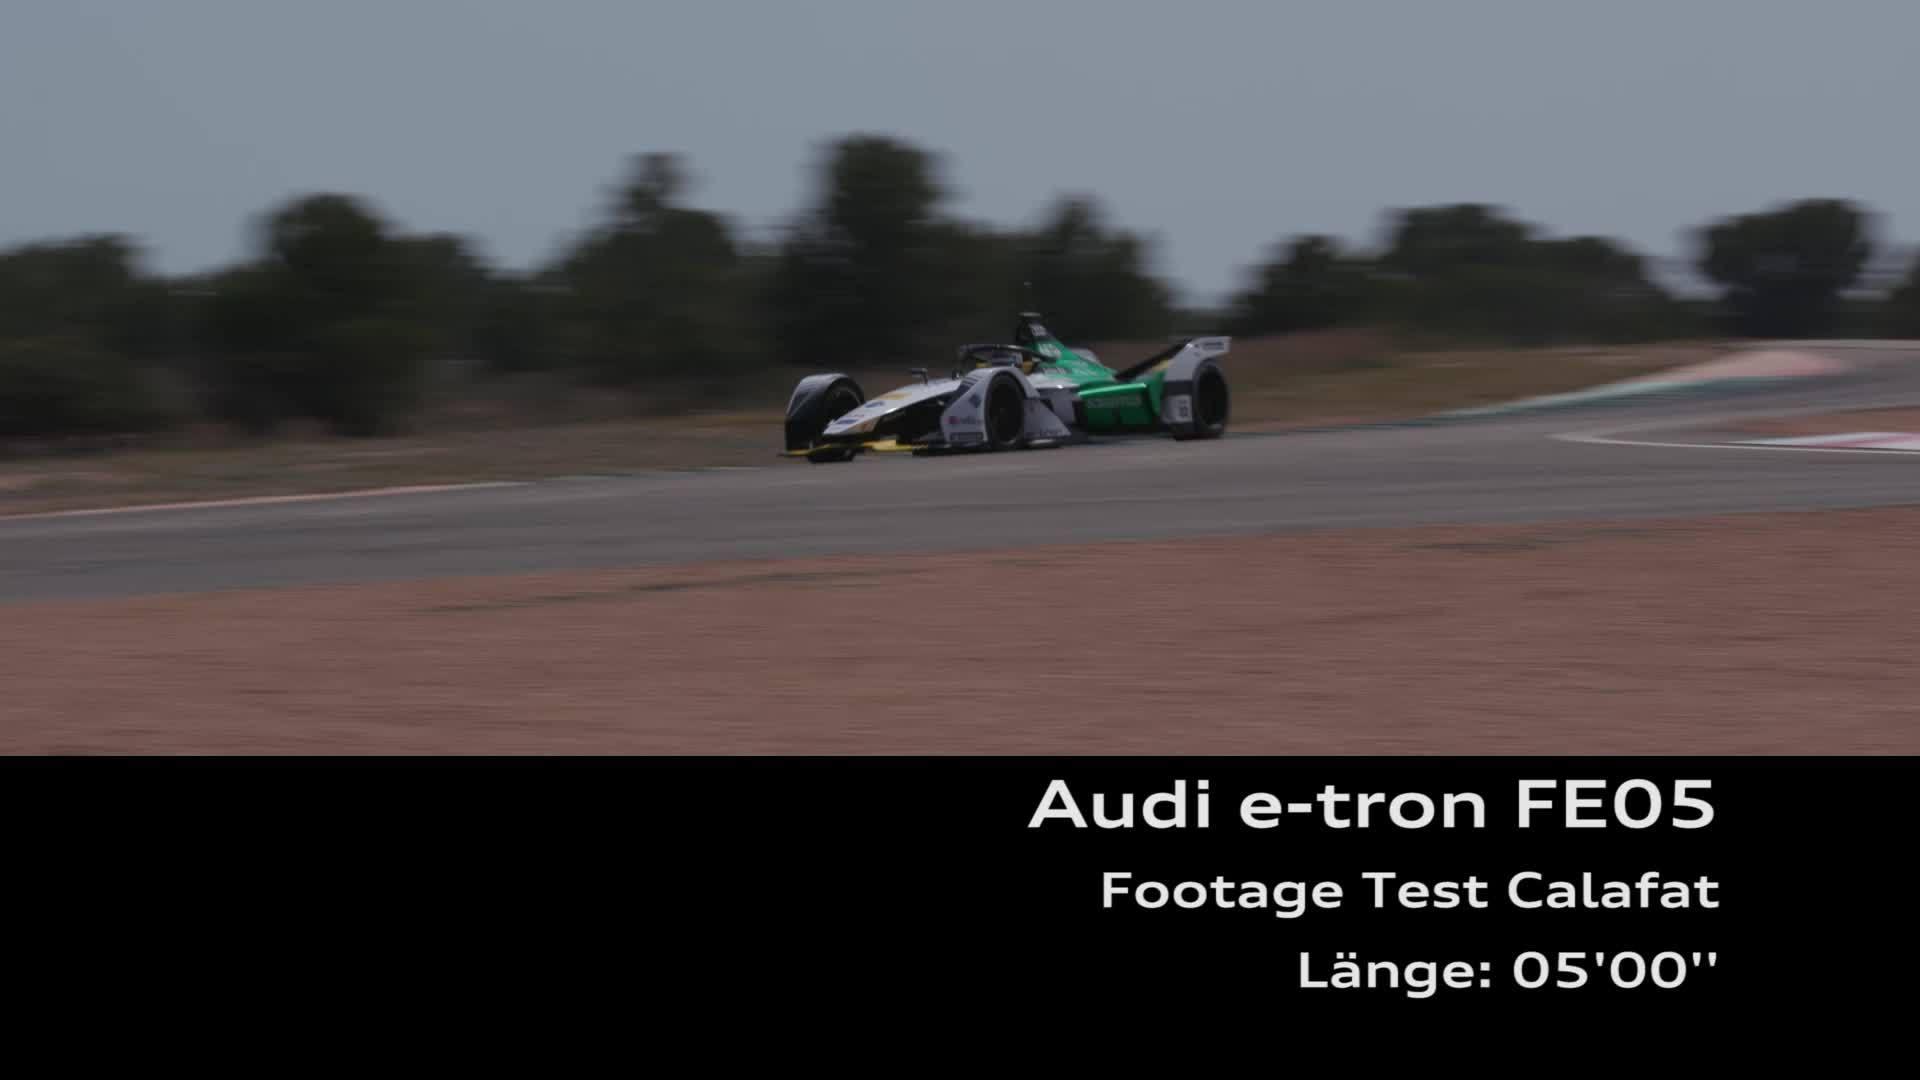 Audi testet den Audi e-tron FE05 für die Formel E